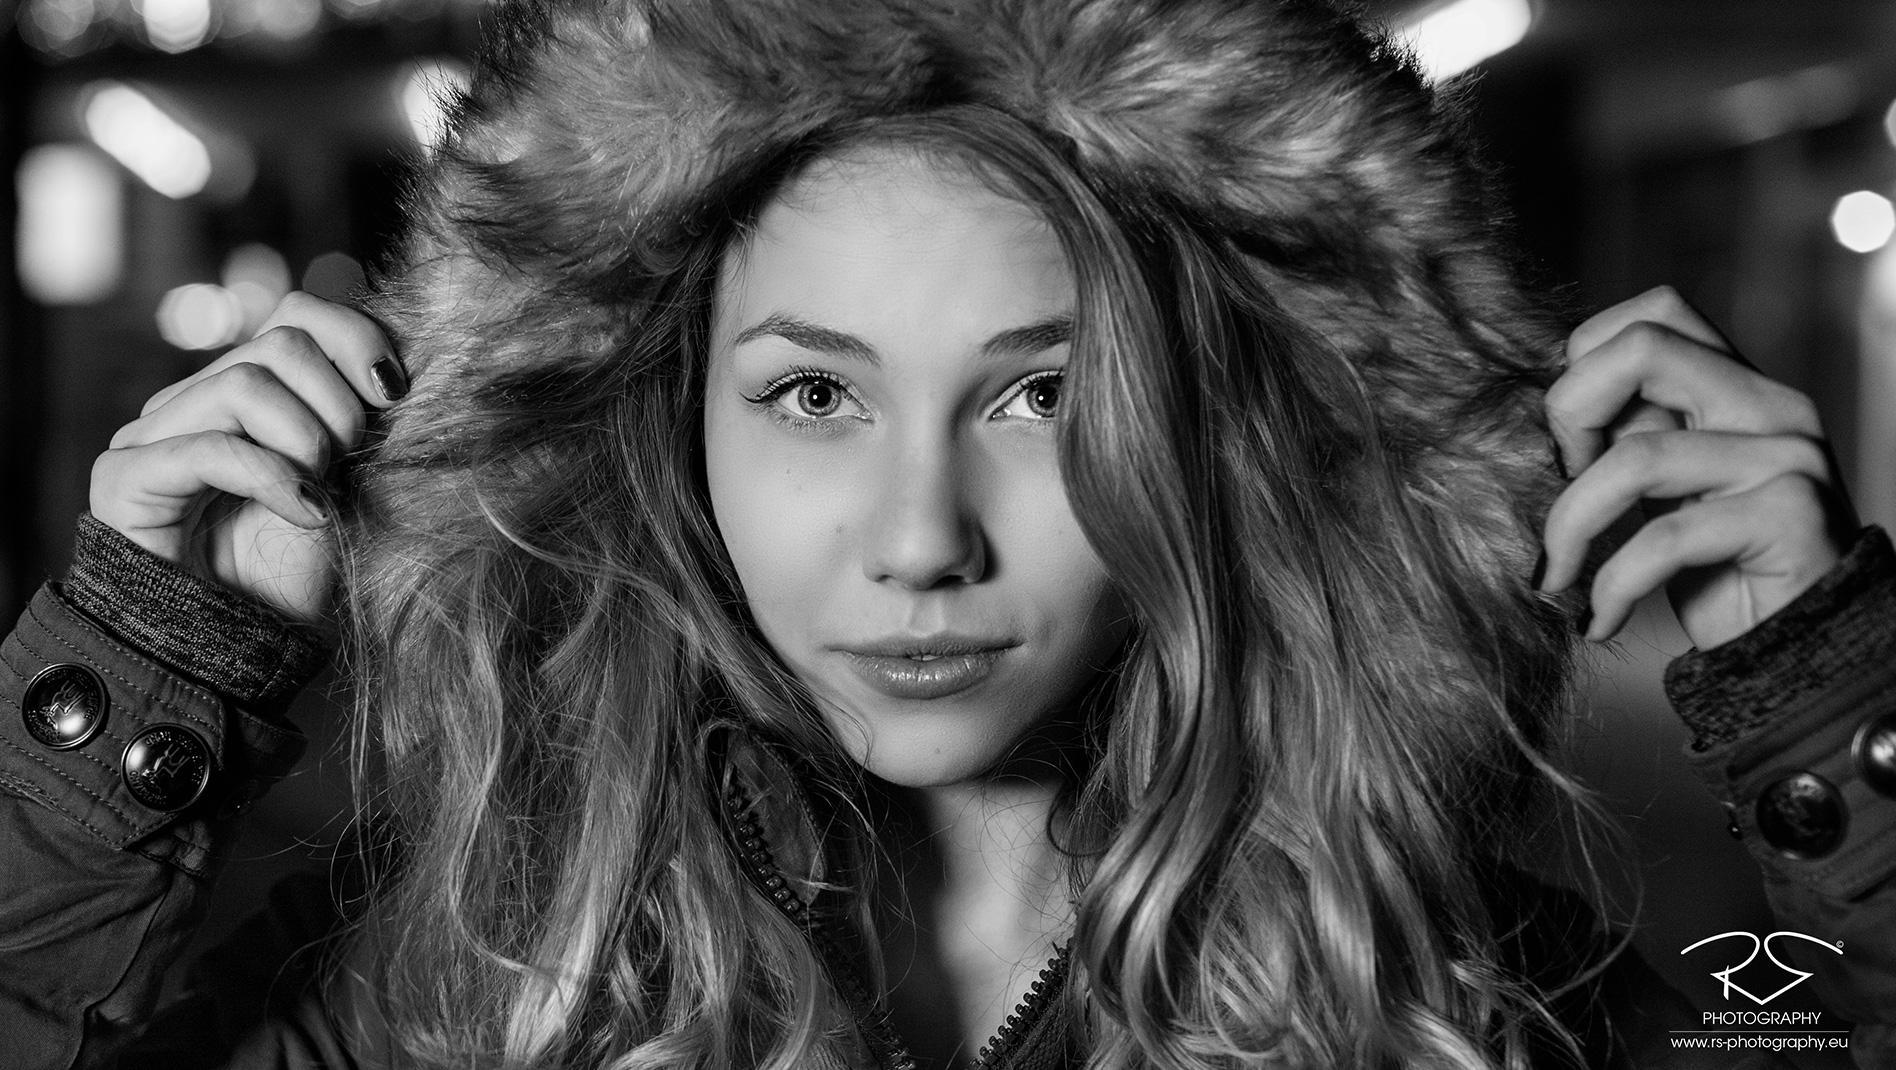 Natasha-Winter_RS_photography-Roman Strazanec